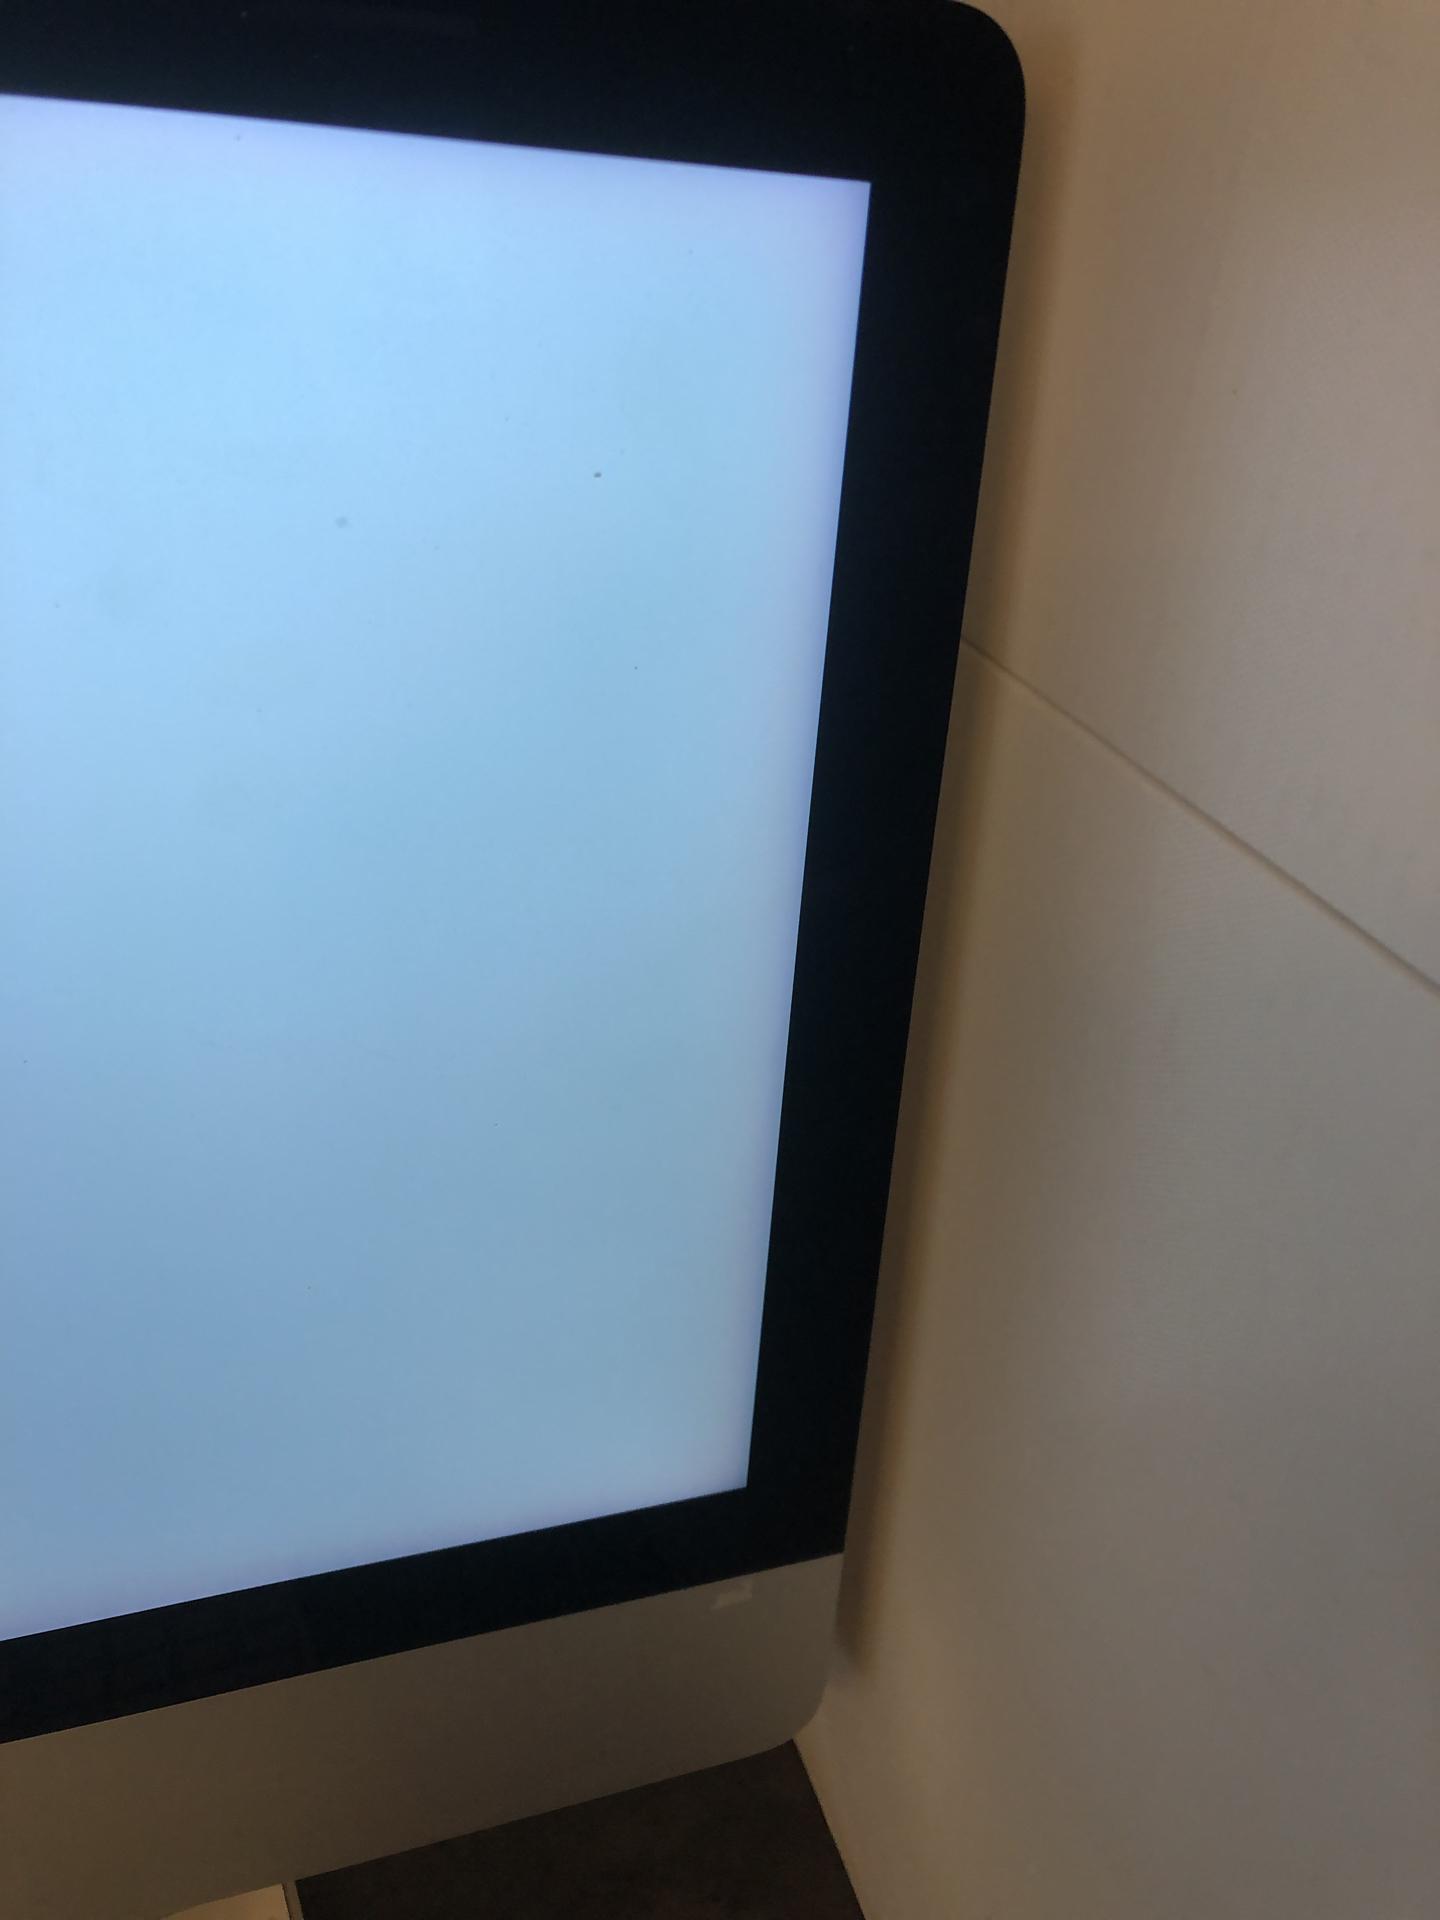 "iMac 21.5"" Retina 4K Late 2015 (Intel Quad-Core i7 3.3 GHz 8 GB RAM 1 TB HDD), Intel Quad-Core i7 3.3 GHz, 8 GB RAM, 1 TB HDD, Afbeelding 4"